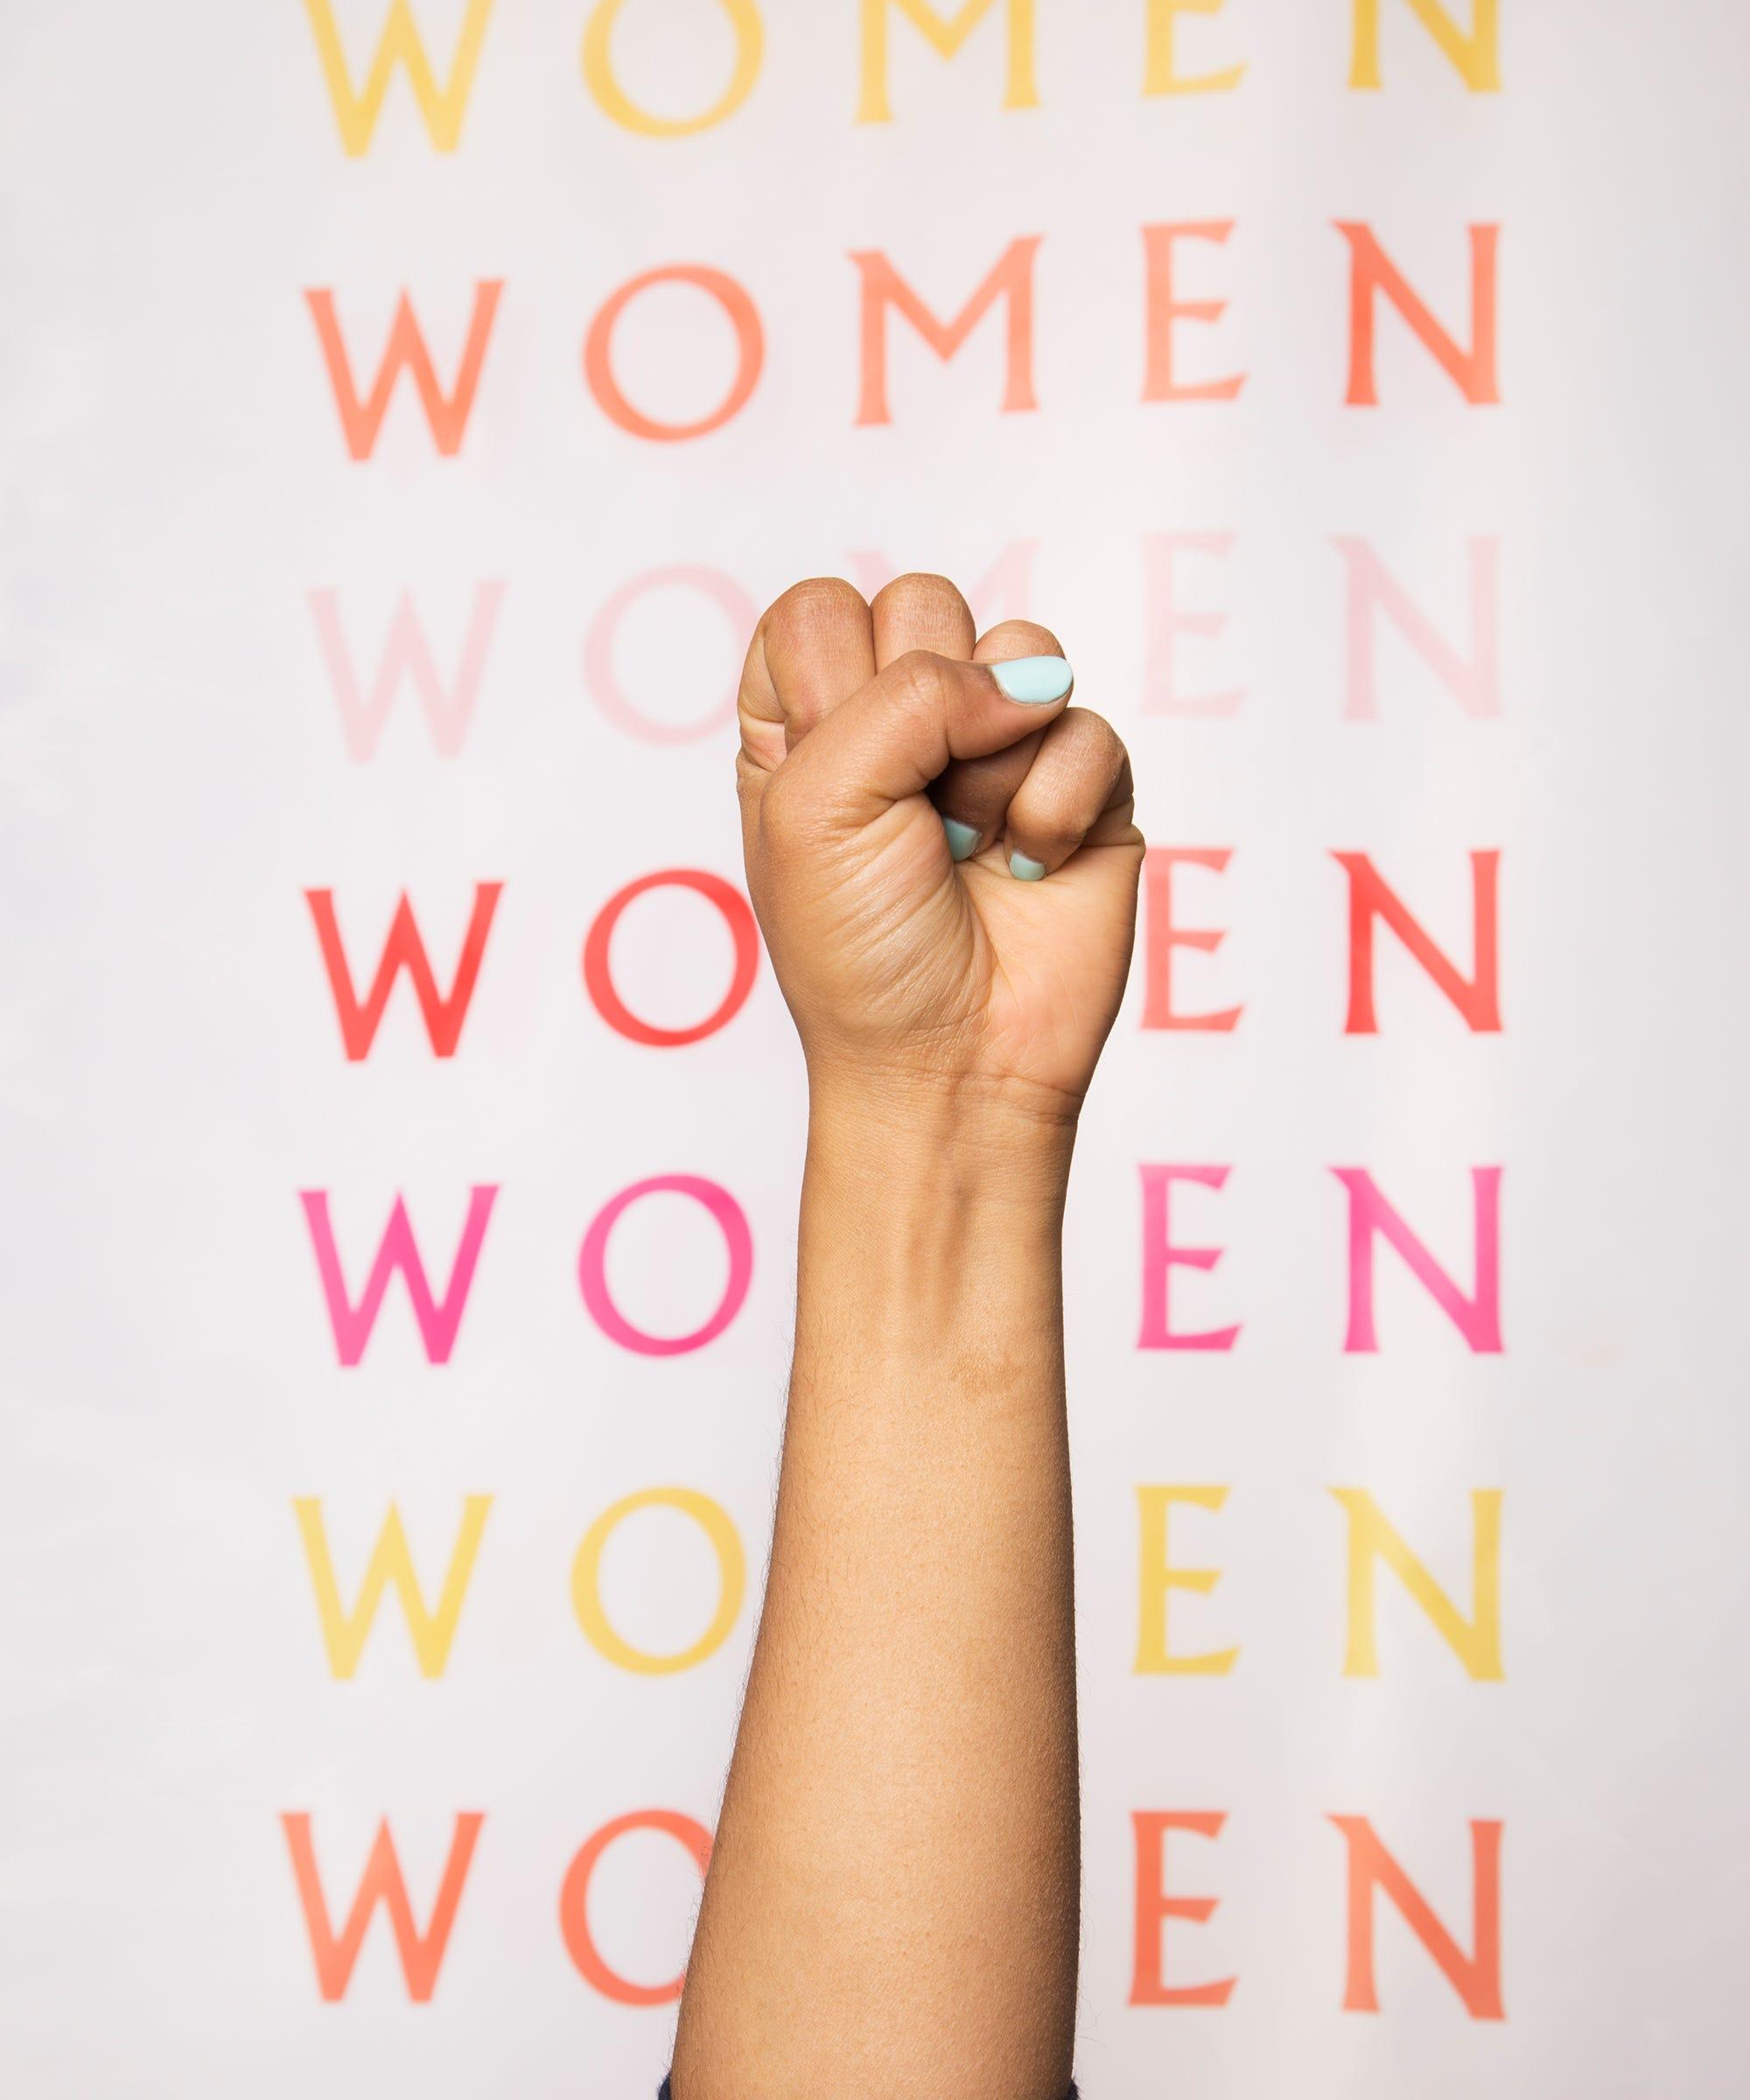 For Women's Health Week, Business Leaders Fight Back